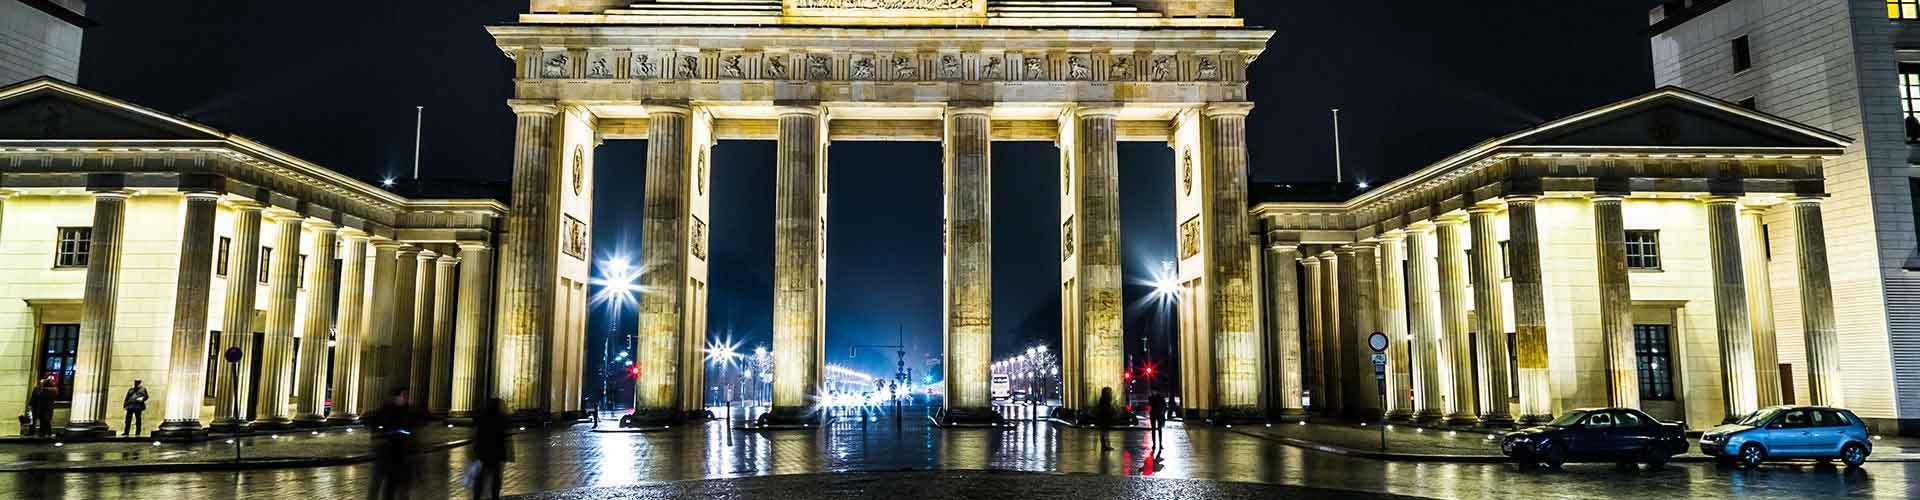 Berlín - Hoteles baratos cerca a Puerta de Brandenburgo. Mapas de Berlín, Fotos y comentarios de cada Hotel en Berlín.